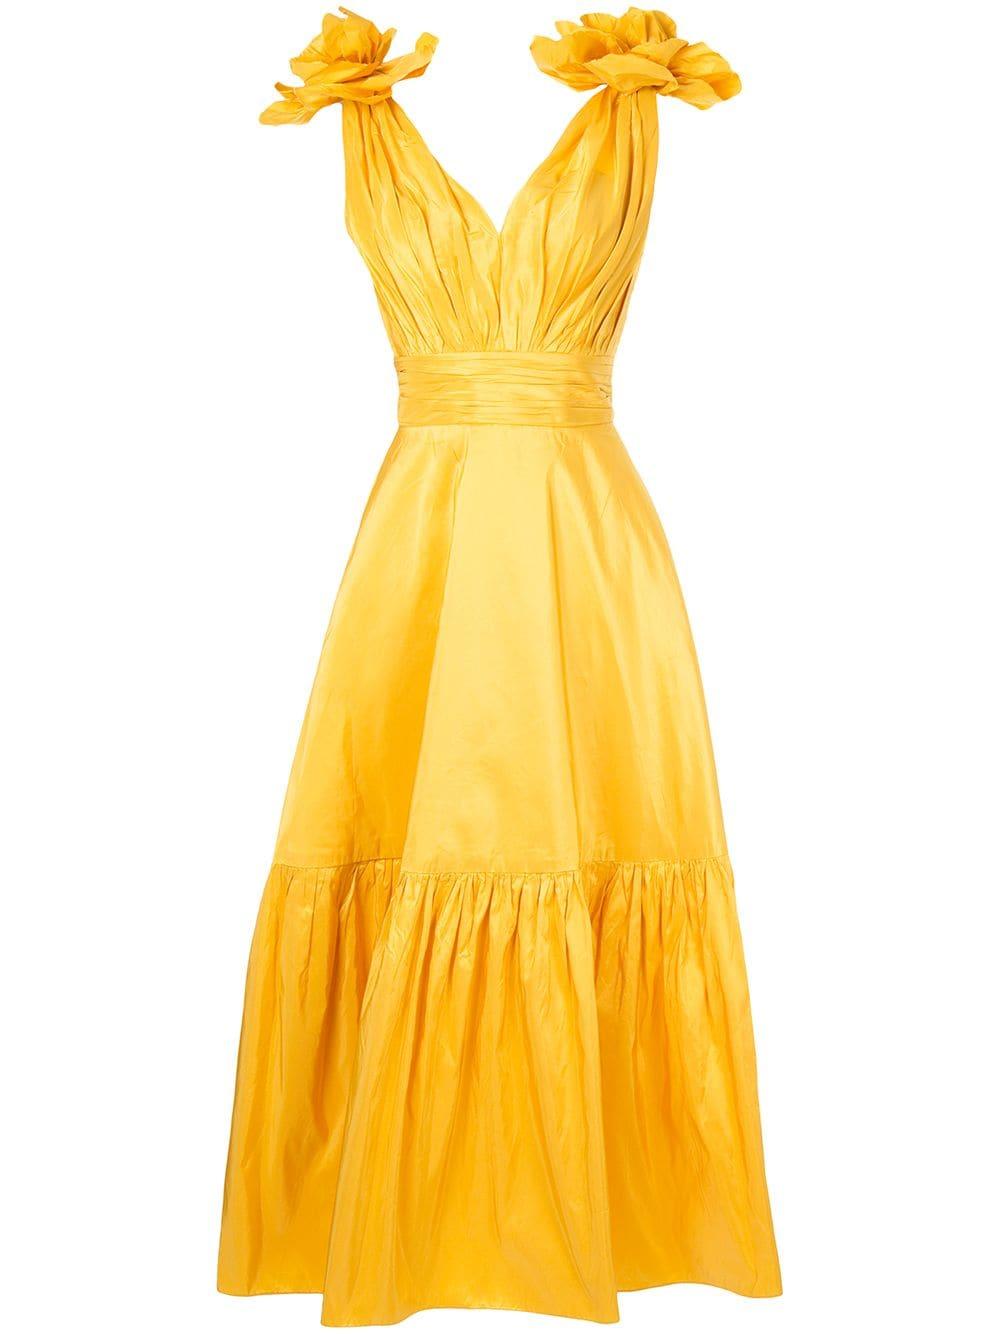 Bambah Sunflower Maxi Dress Farfetch Dresses Yellow Dress Yellow Dress Outfit [ 1334 x 1000 Pixel ]